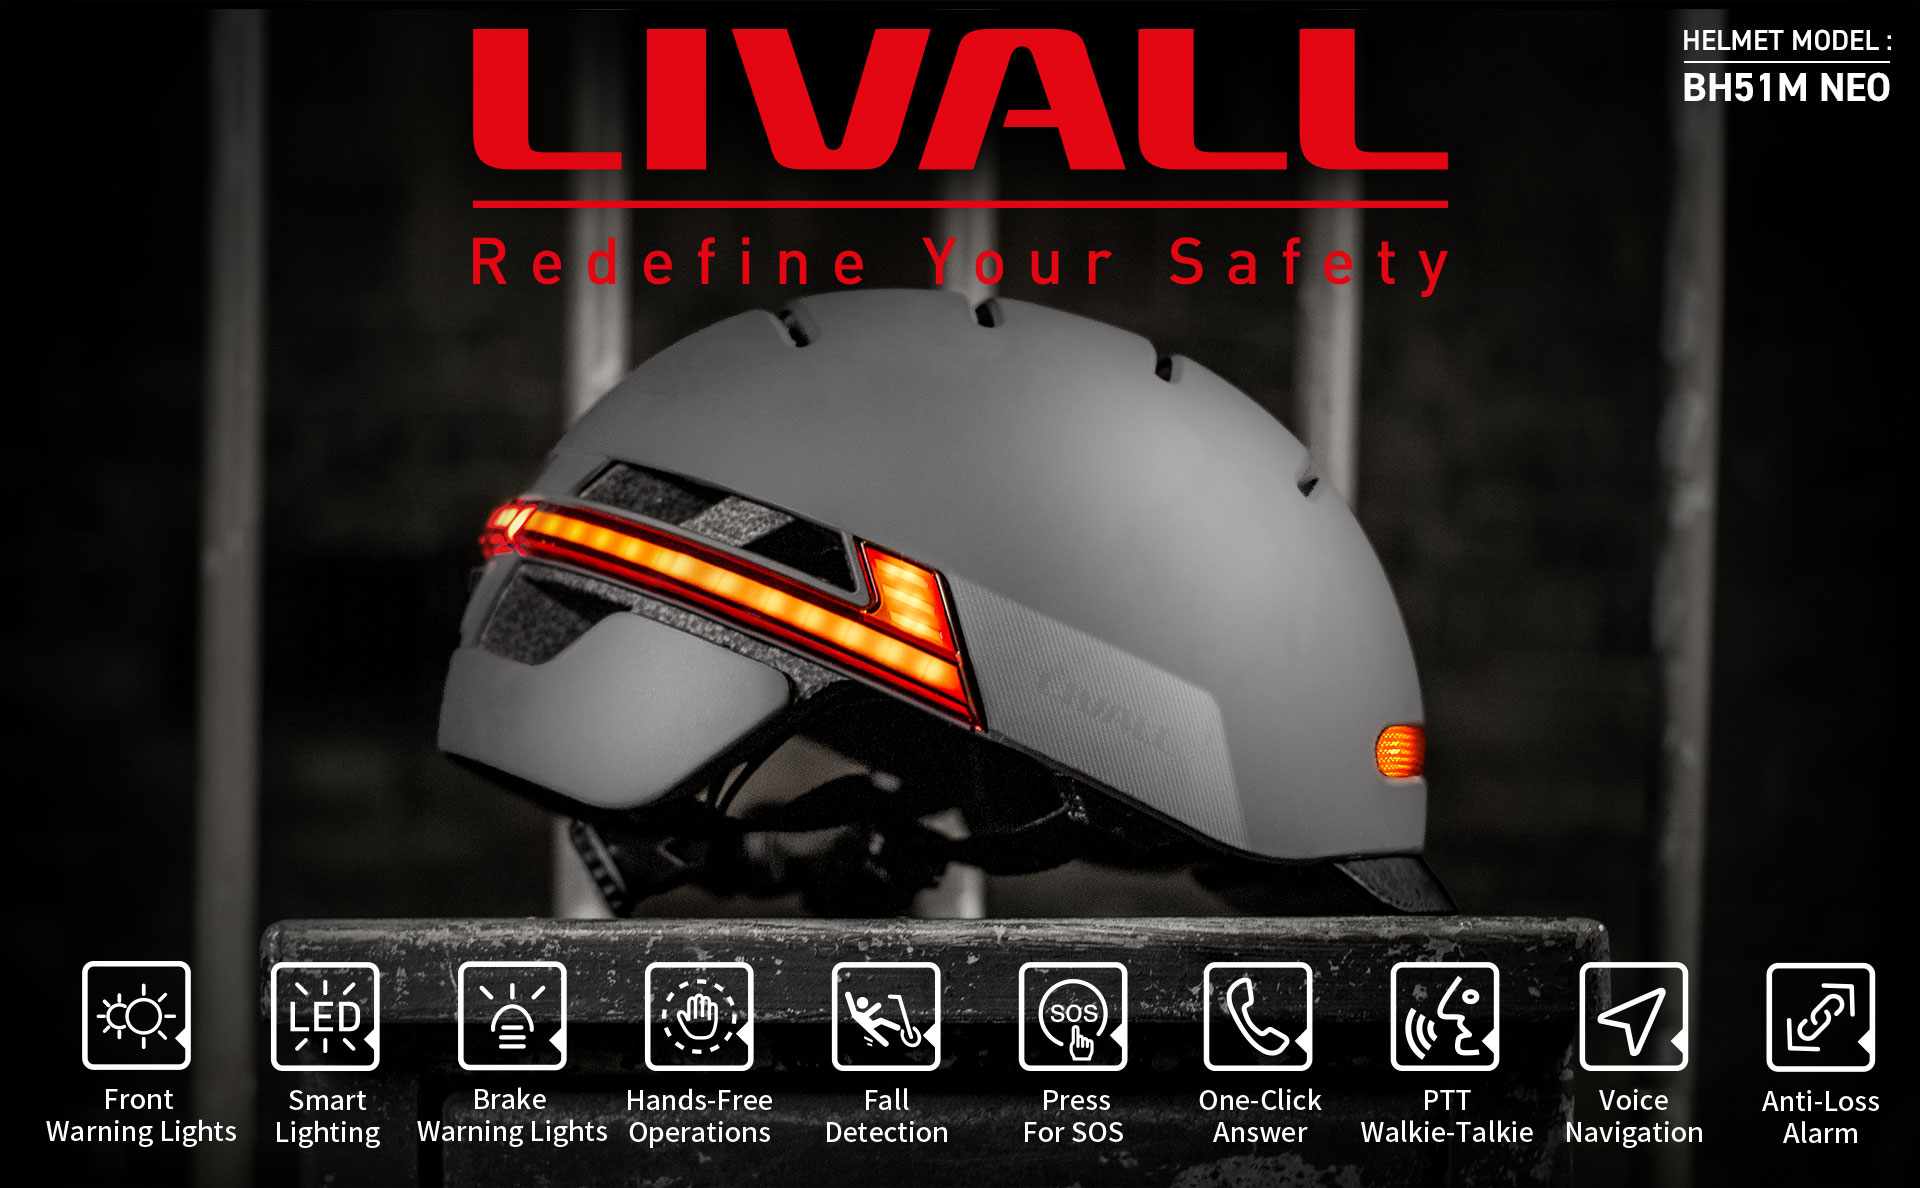 LIVALL-BH51M-NEO